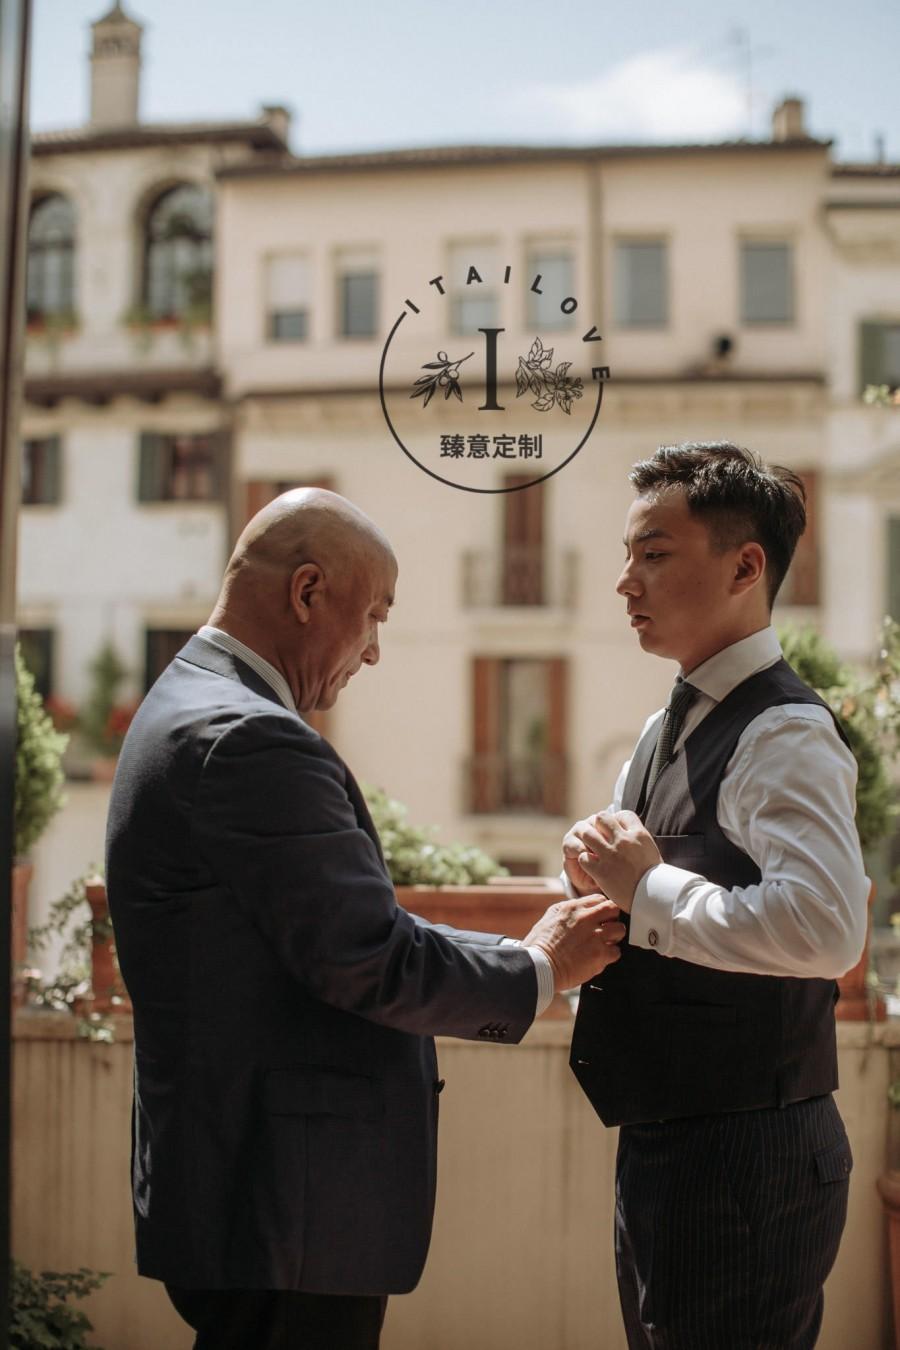 wedding-in-Italy-Verona-sitong-zhe8